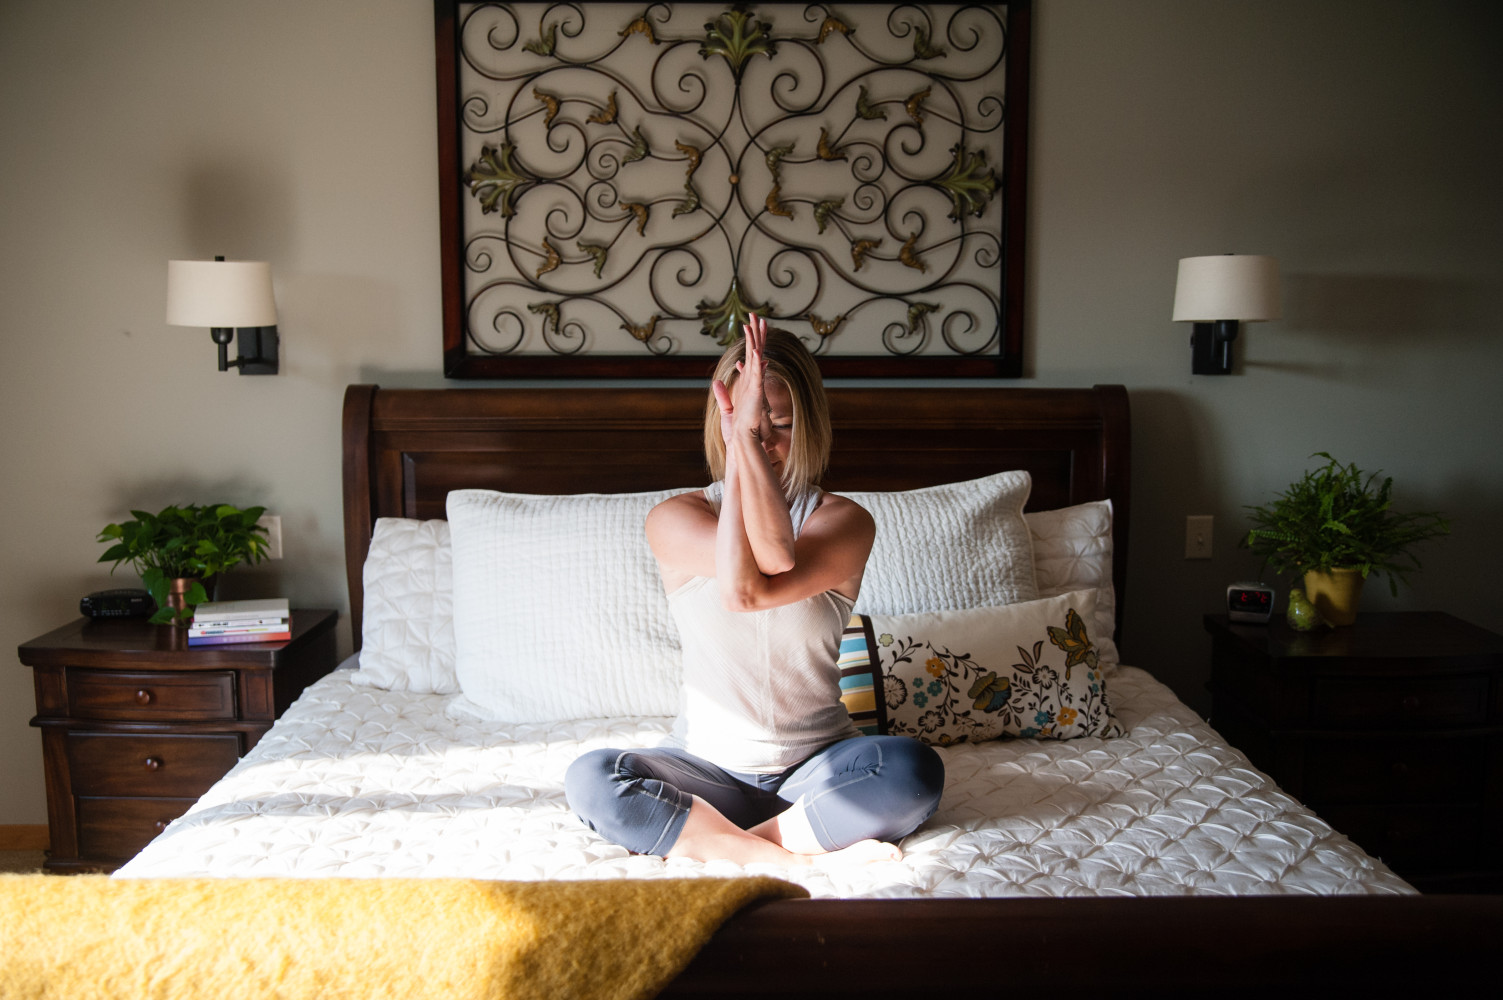 Bed-Yoga-31-e1408116143580.jpg